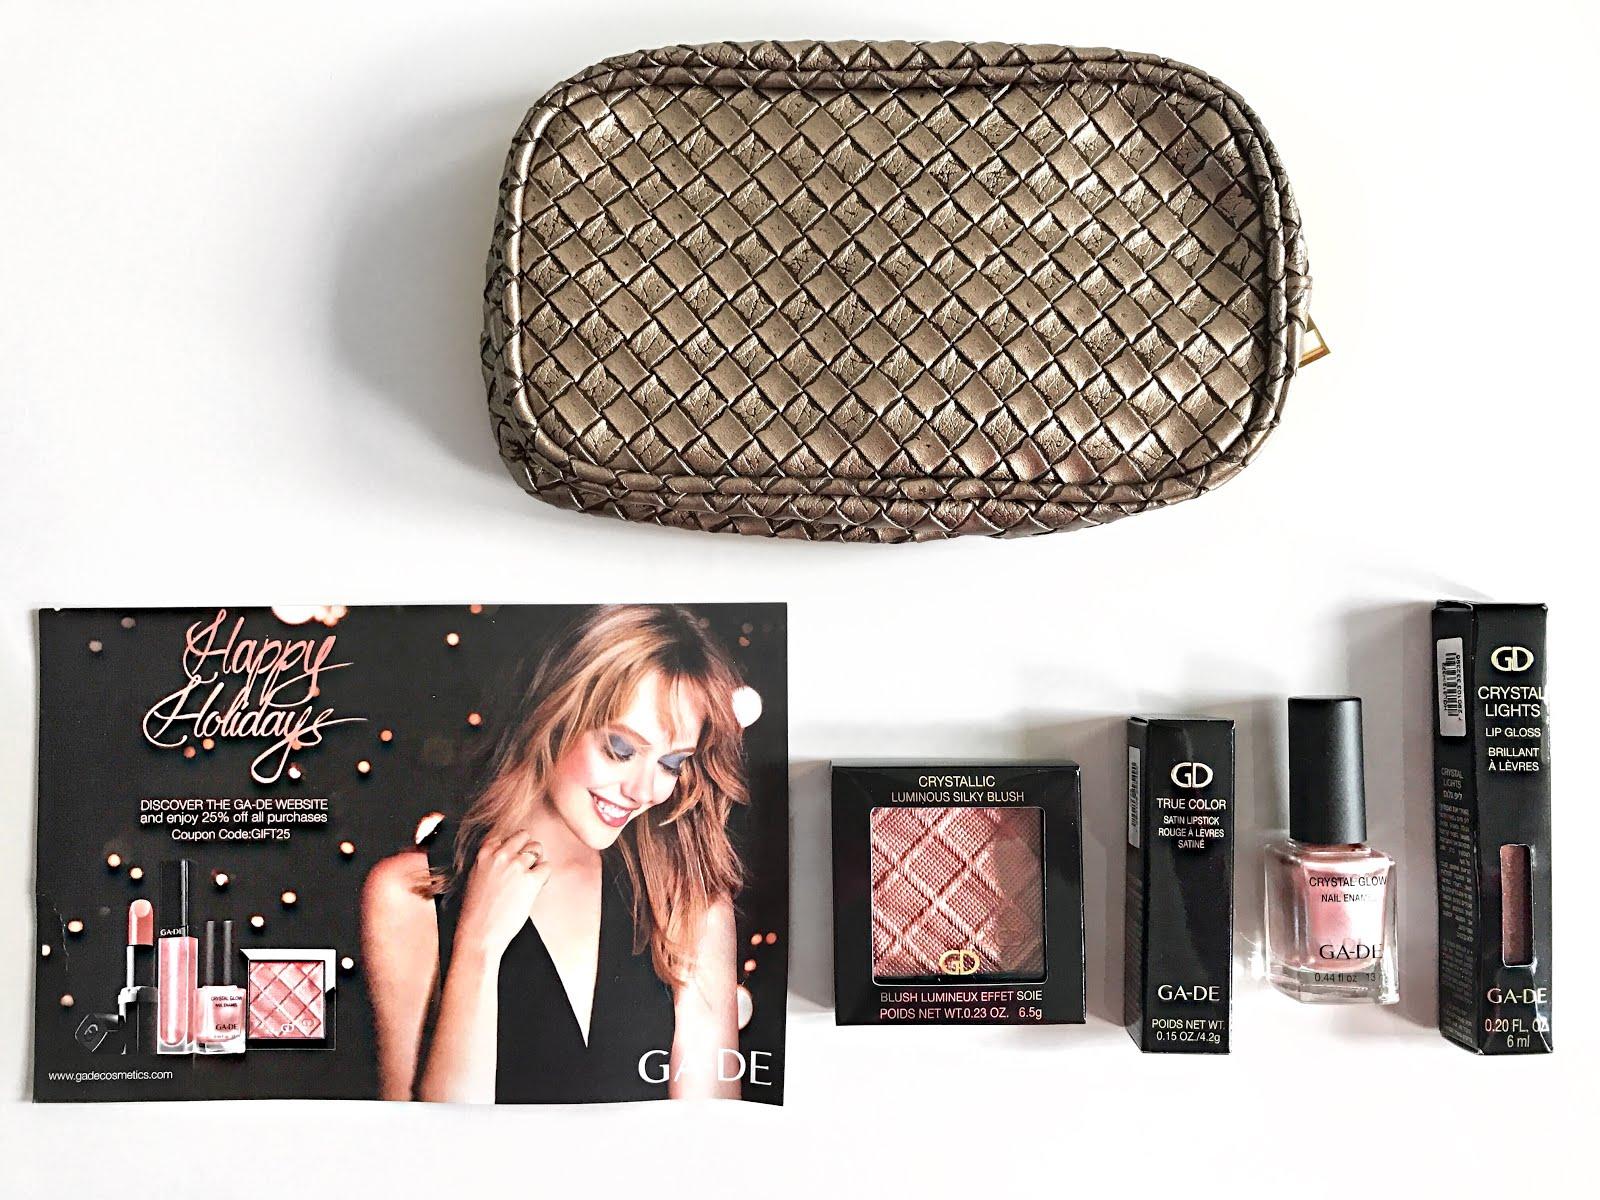 POM-Mail-Milk-Makeup-Make-Up-For-Ever-Maybelline-Nip-And-Fab-Ogx-Beauty-Vivi-Brizuela-PinkOrchidMakeup